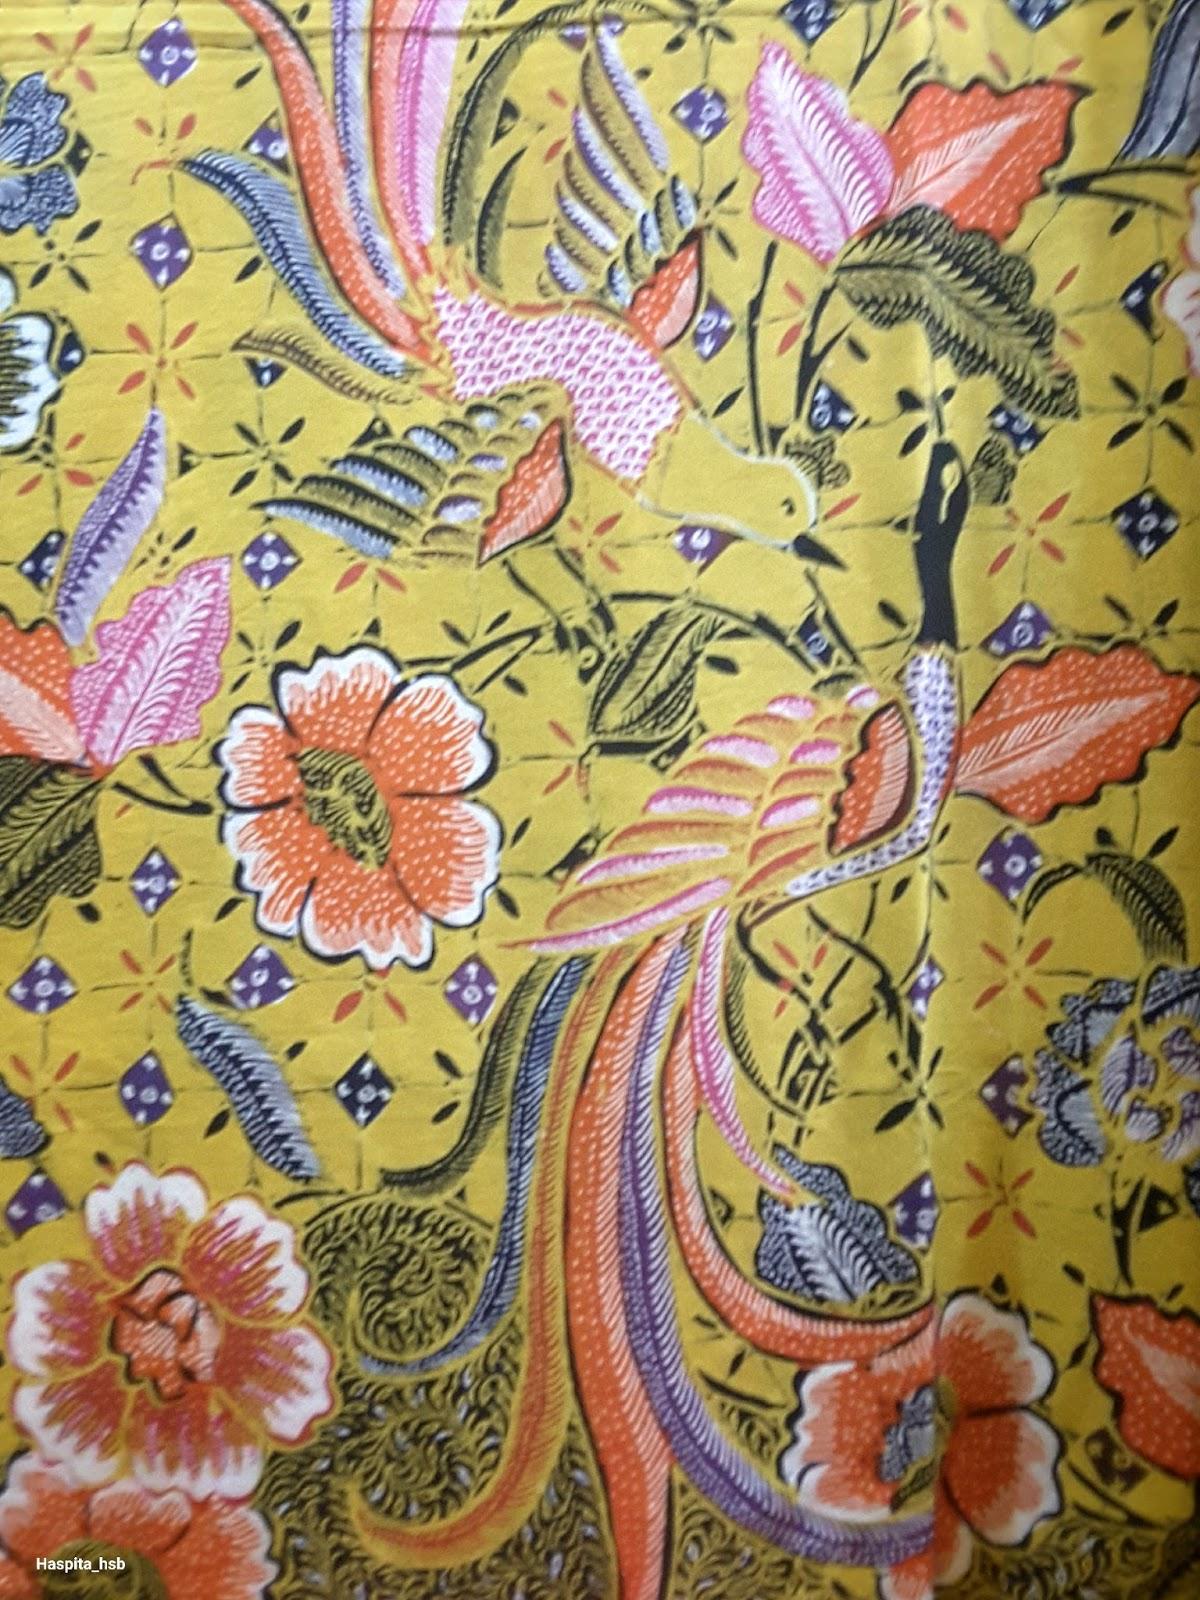 Haspita Hasibuan: Batik is the art of painting on cloth.